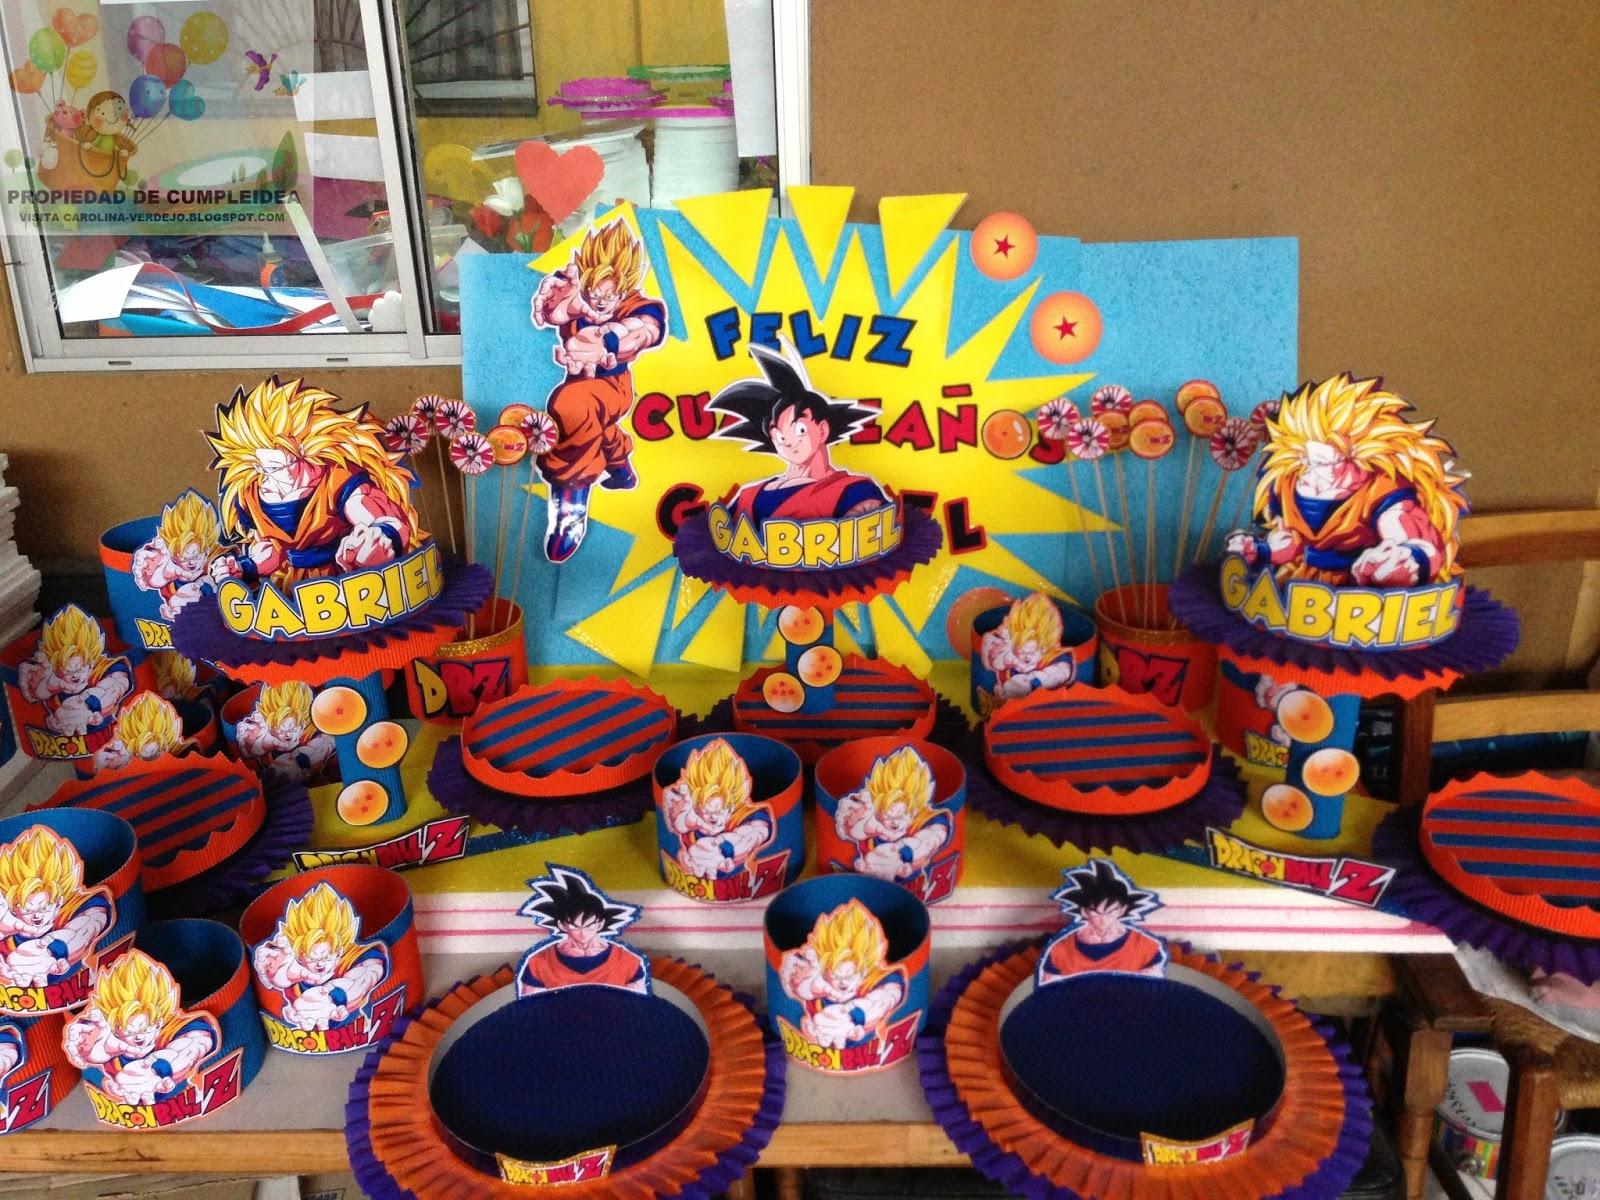 Decoraciones infantiles dragon ball z - Decoracion de centros de mesa ...